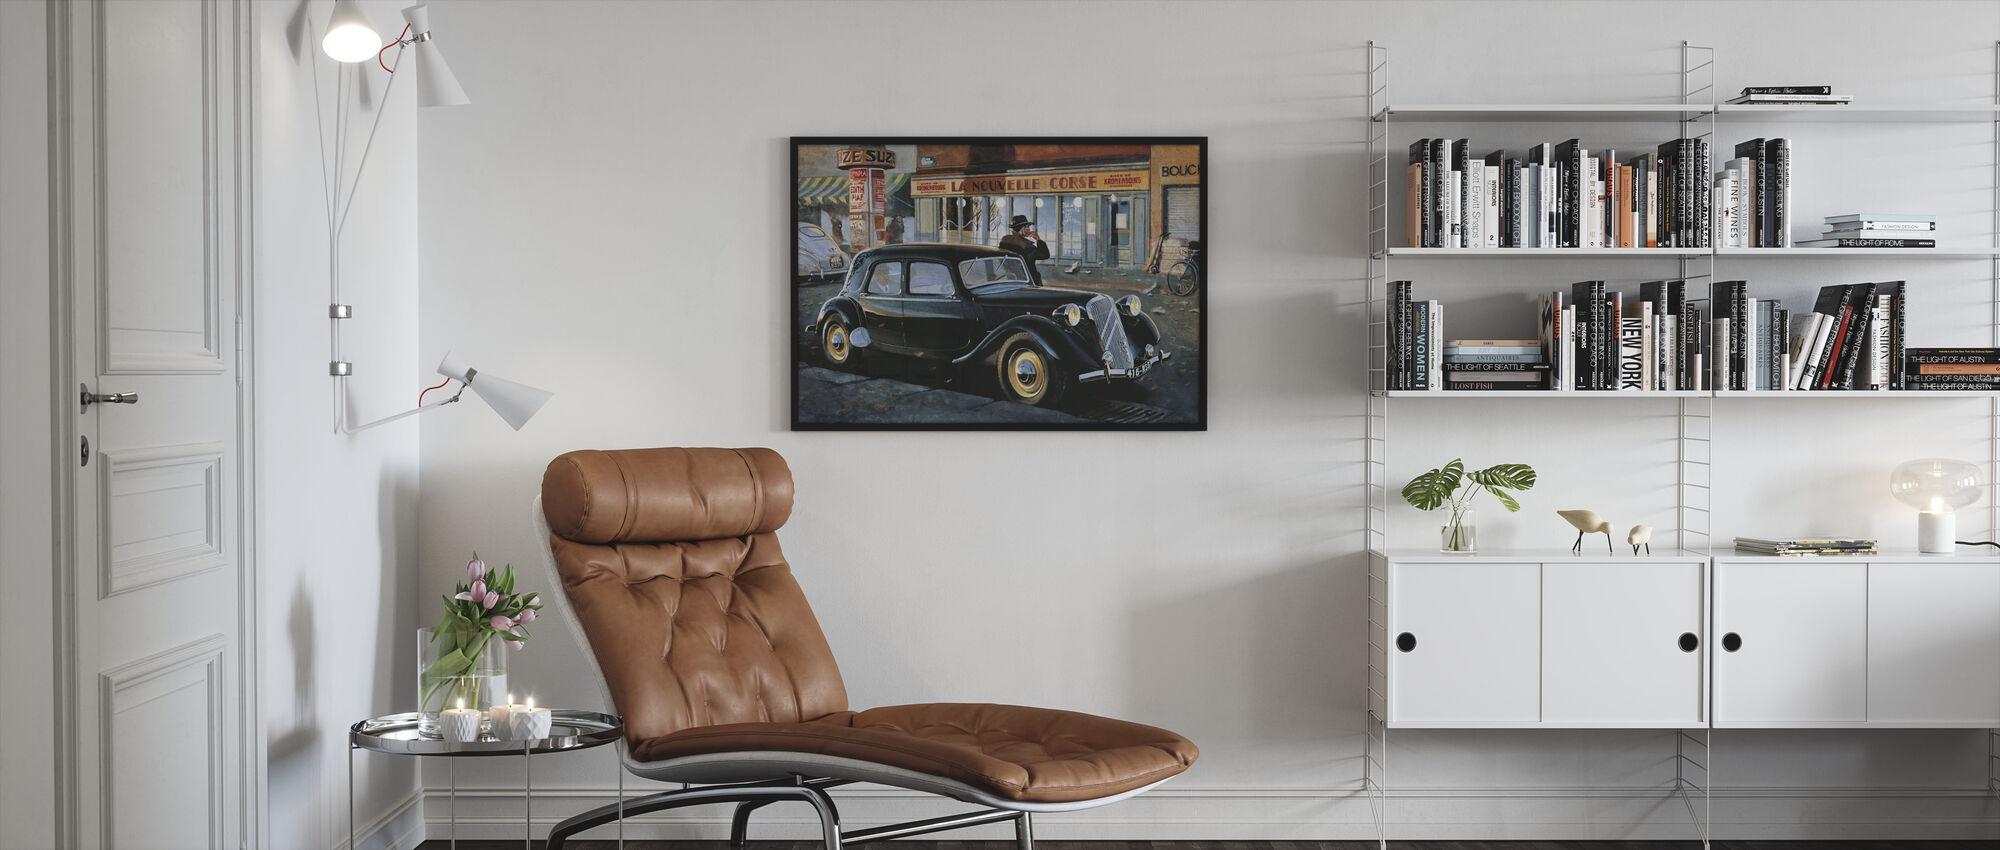 B15 in Paris - Framed print - Living Room